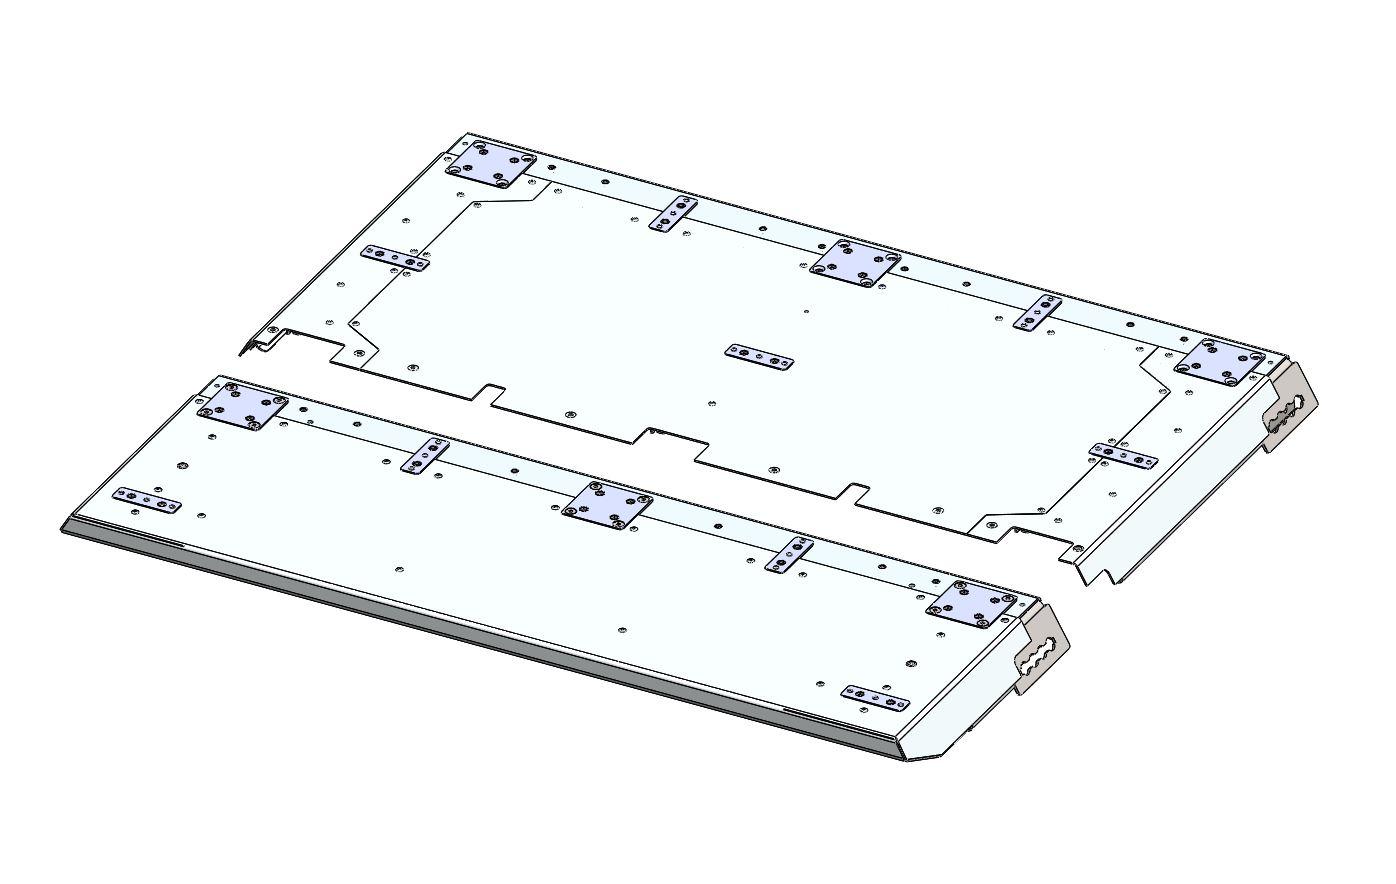 ESEL | Heckmodul komplett 970mm L-RS